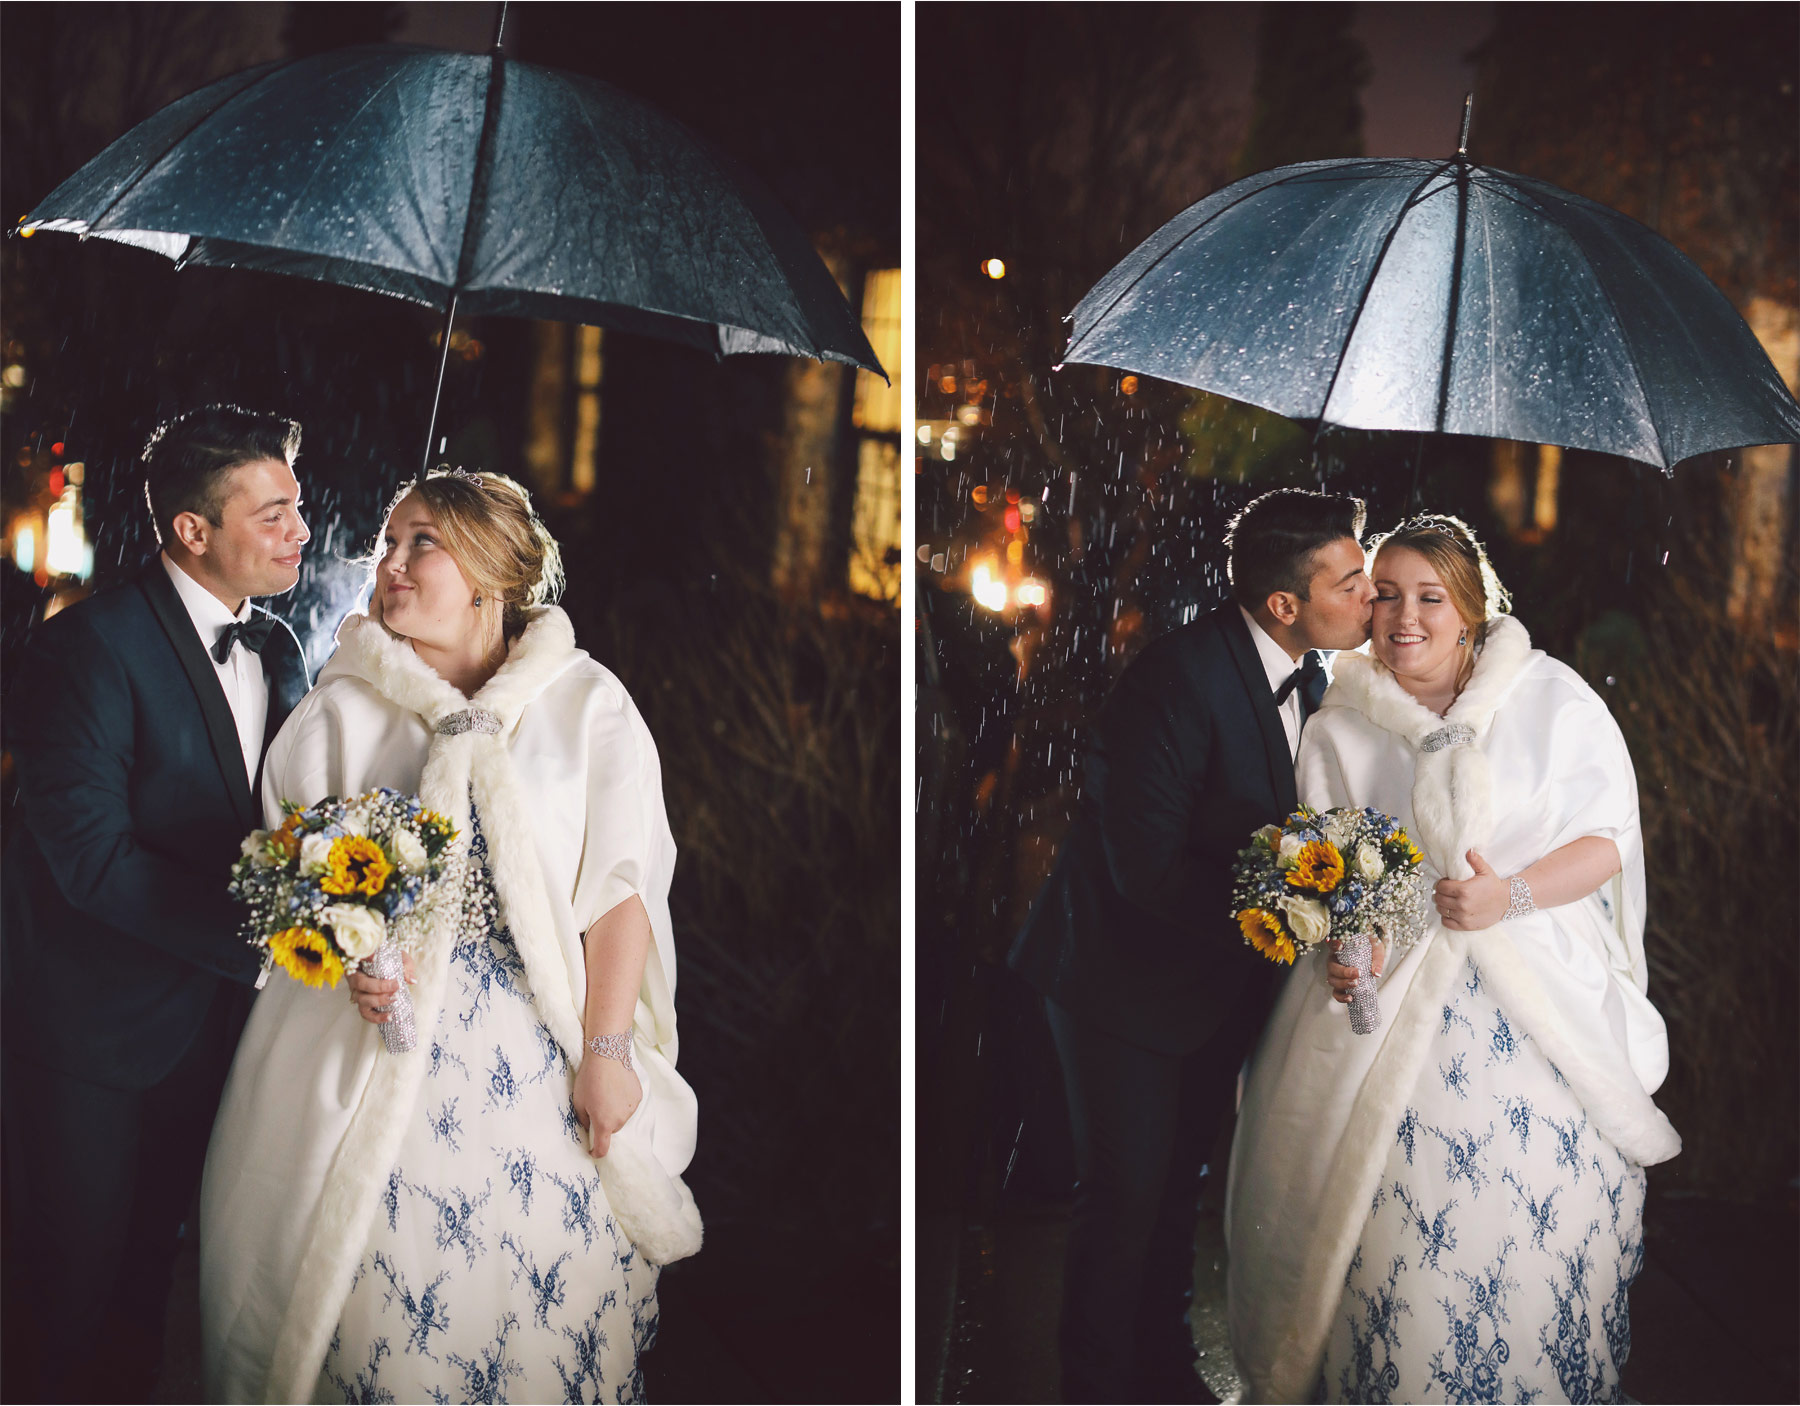 12-Saint-Paul-Minnesota-Wedding-Photography-by-Vick-Photography-The-University-Club-Night-Photography-Rain-Umbrella-Mari-and-Giuseppe.jpg